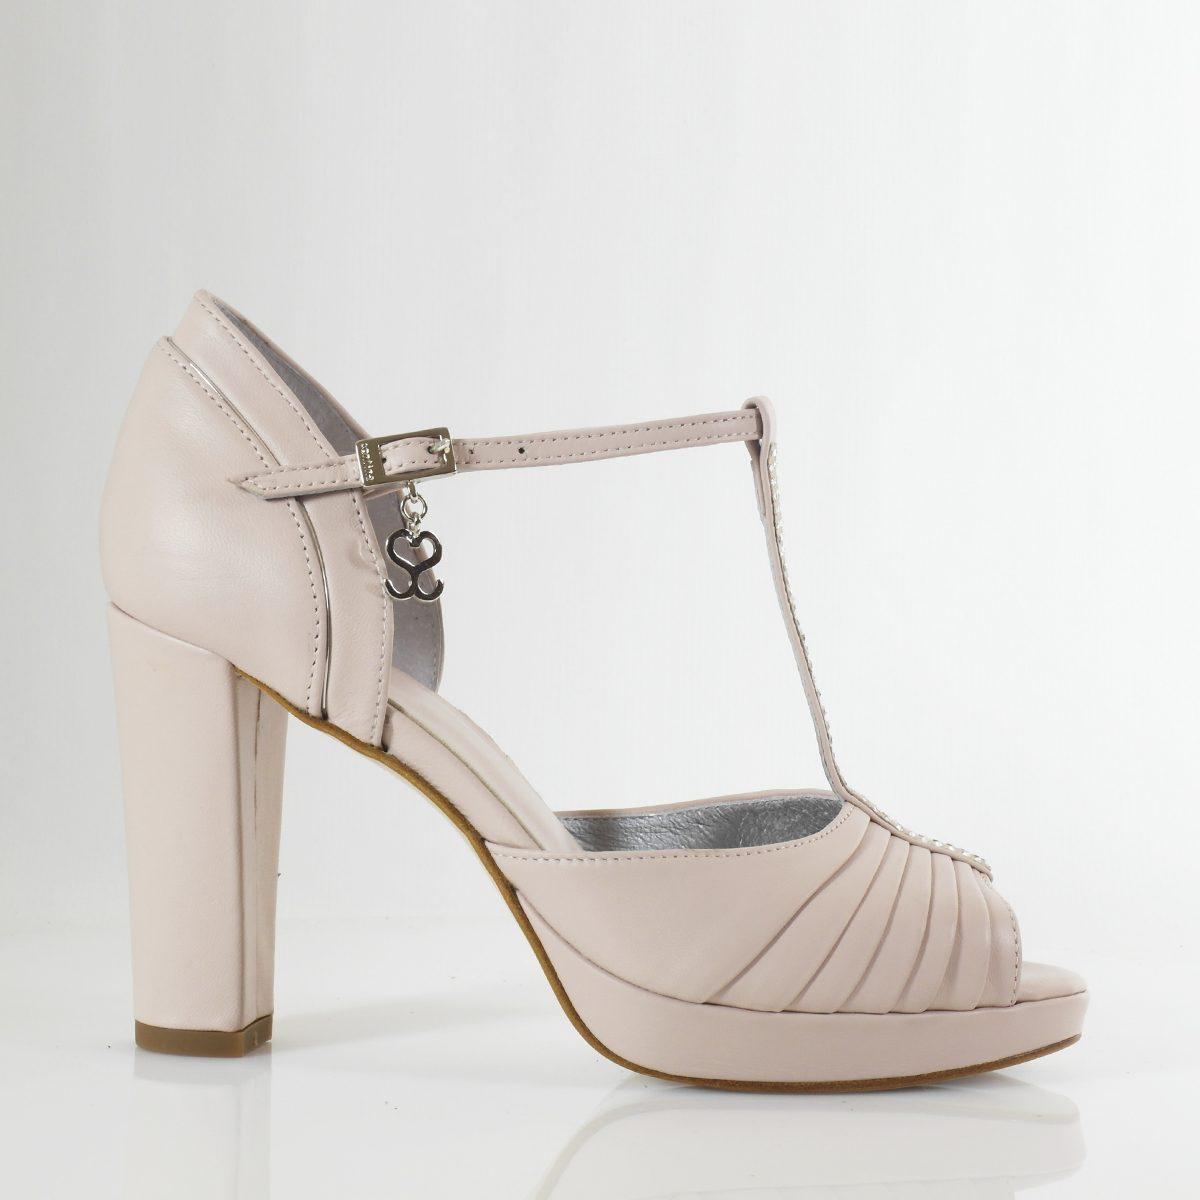 SANDALIA MOD.2332 (10cm)- zapatos personalizados fiesta